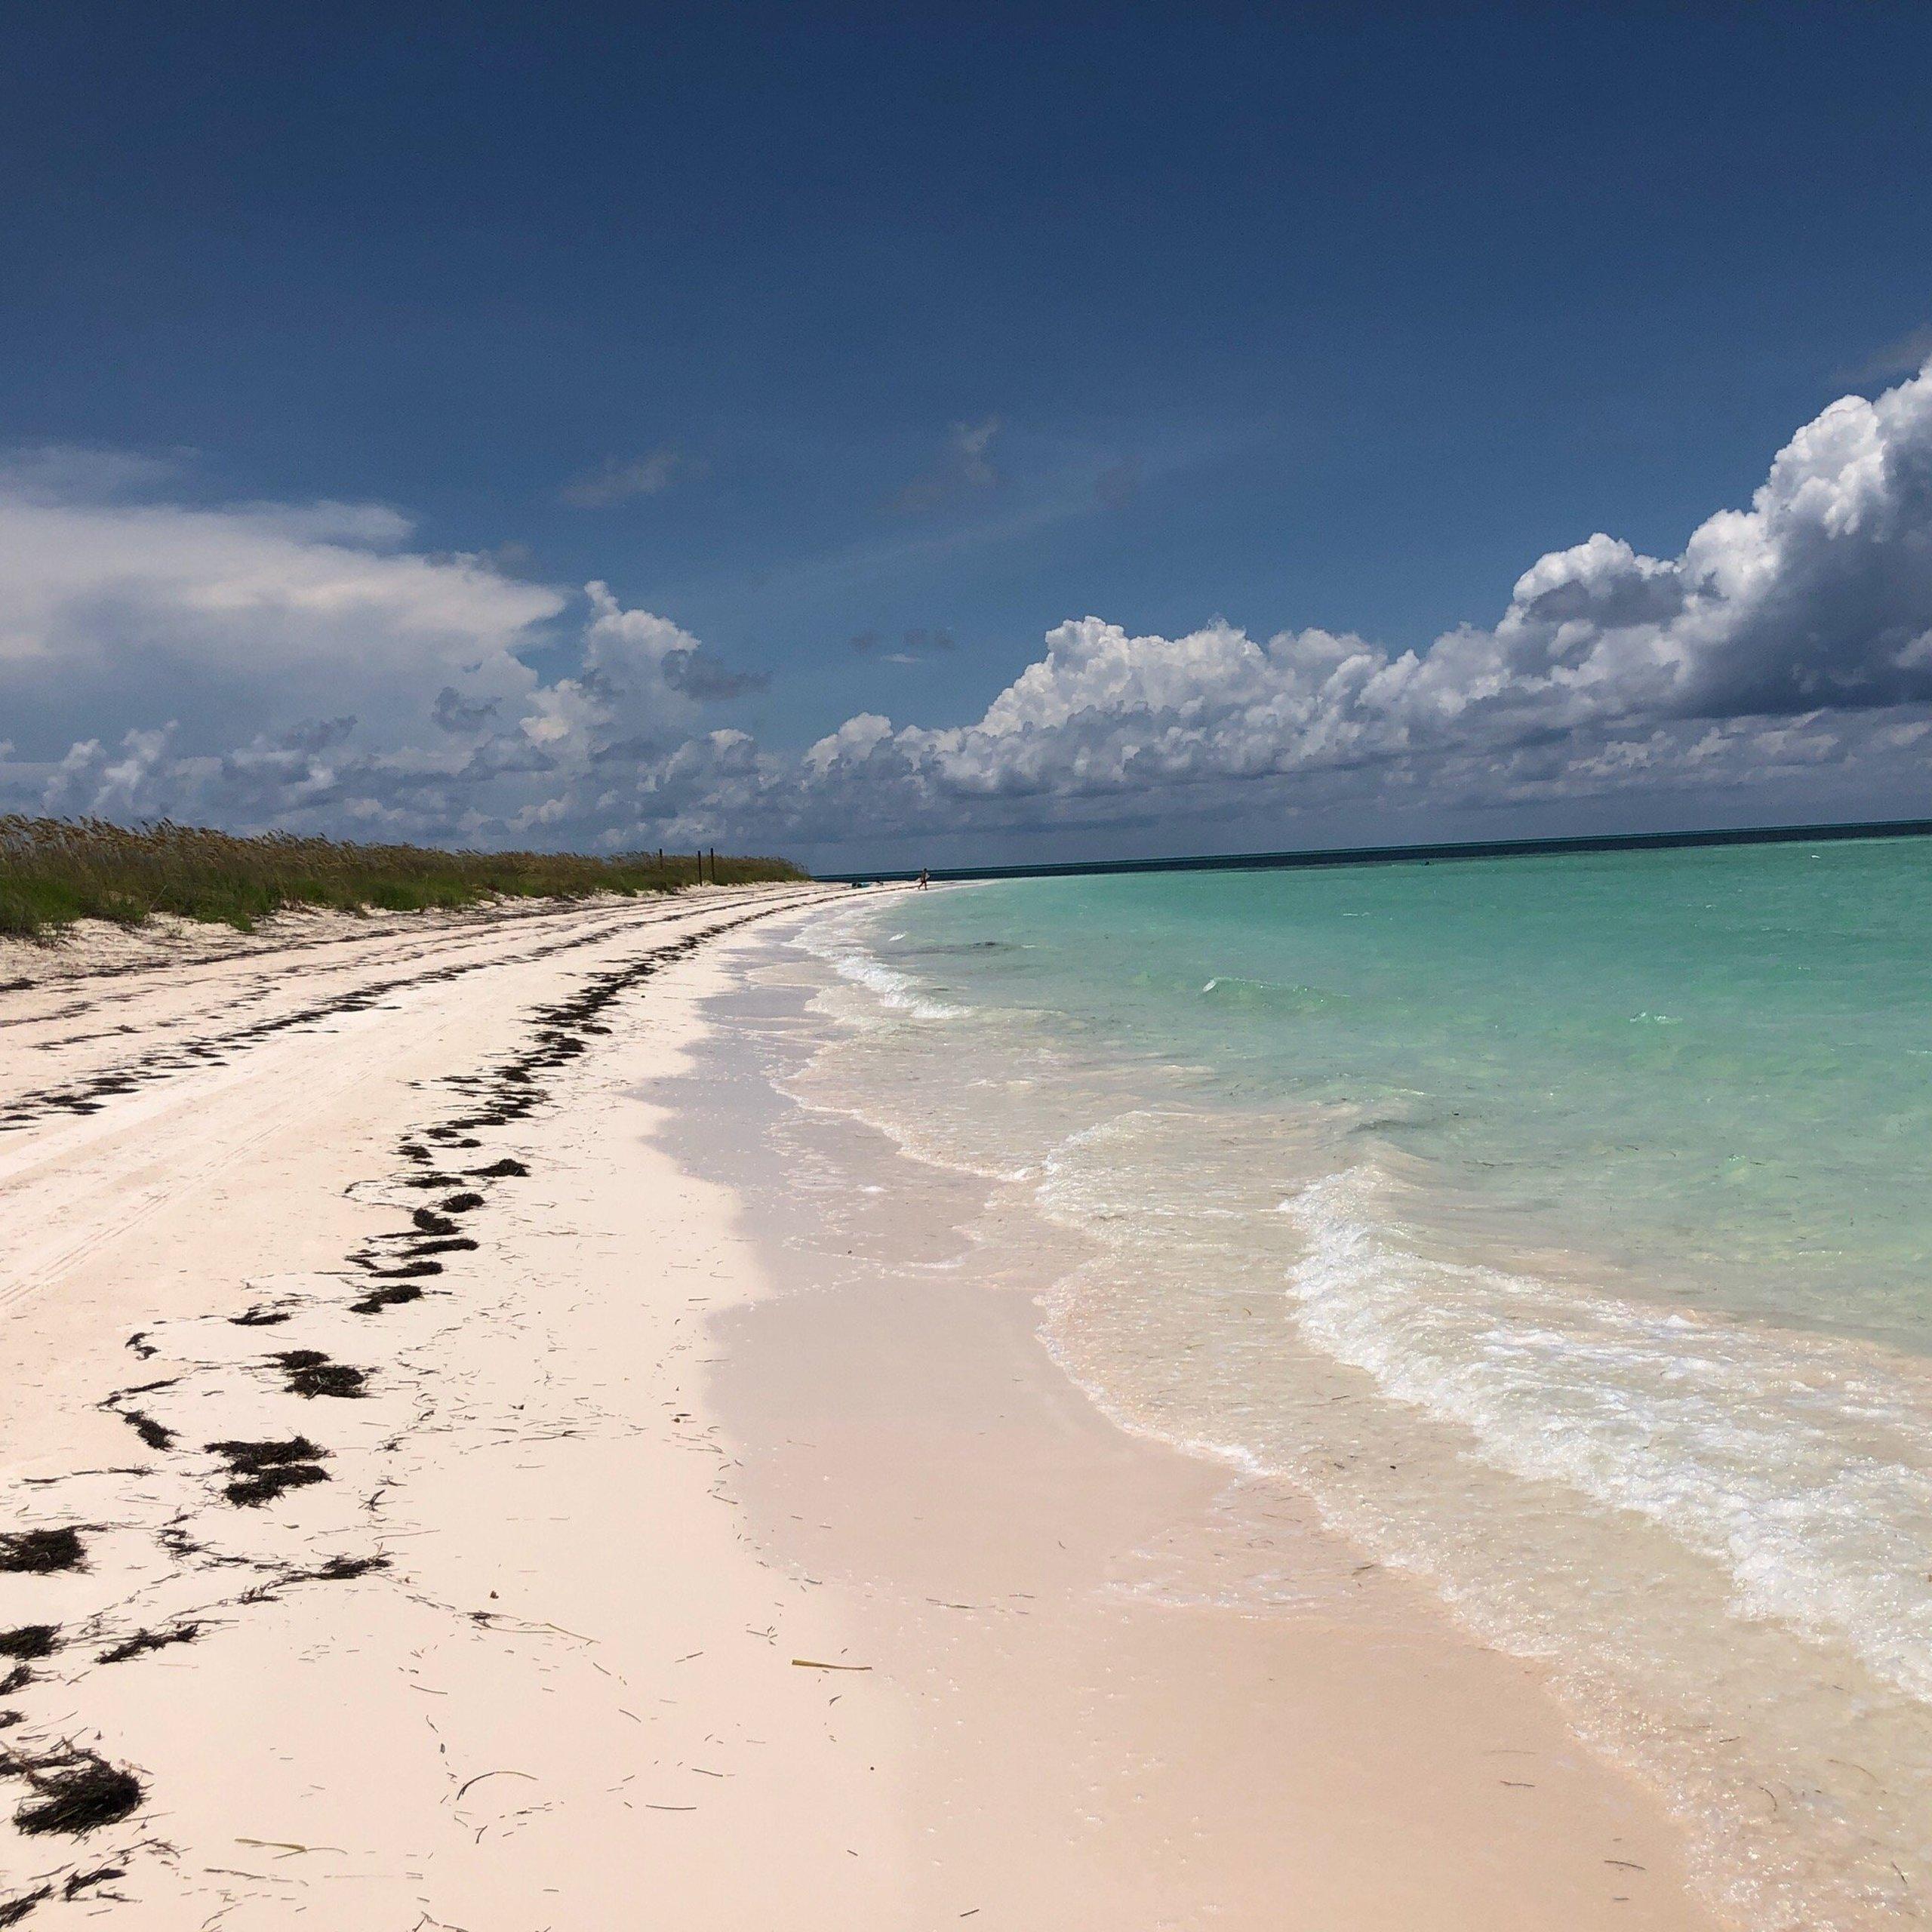 spanish wells 2019: best of spanish wells, bahamas tourism